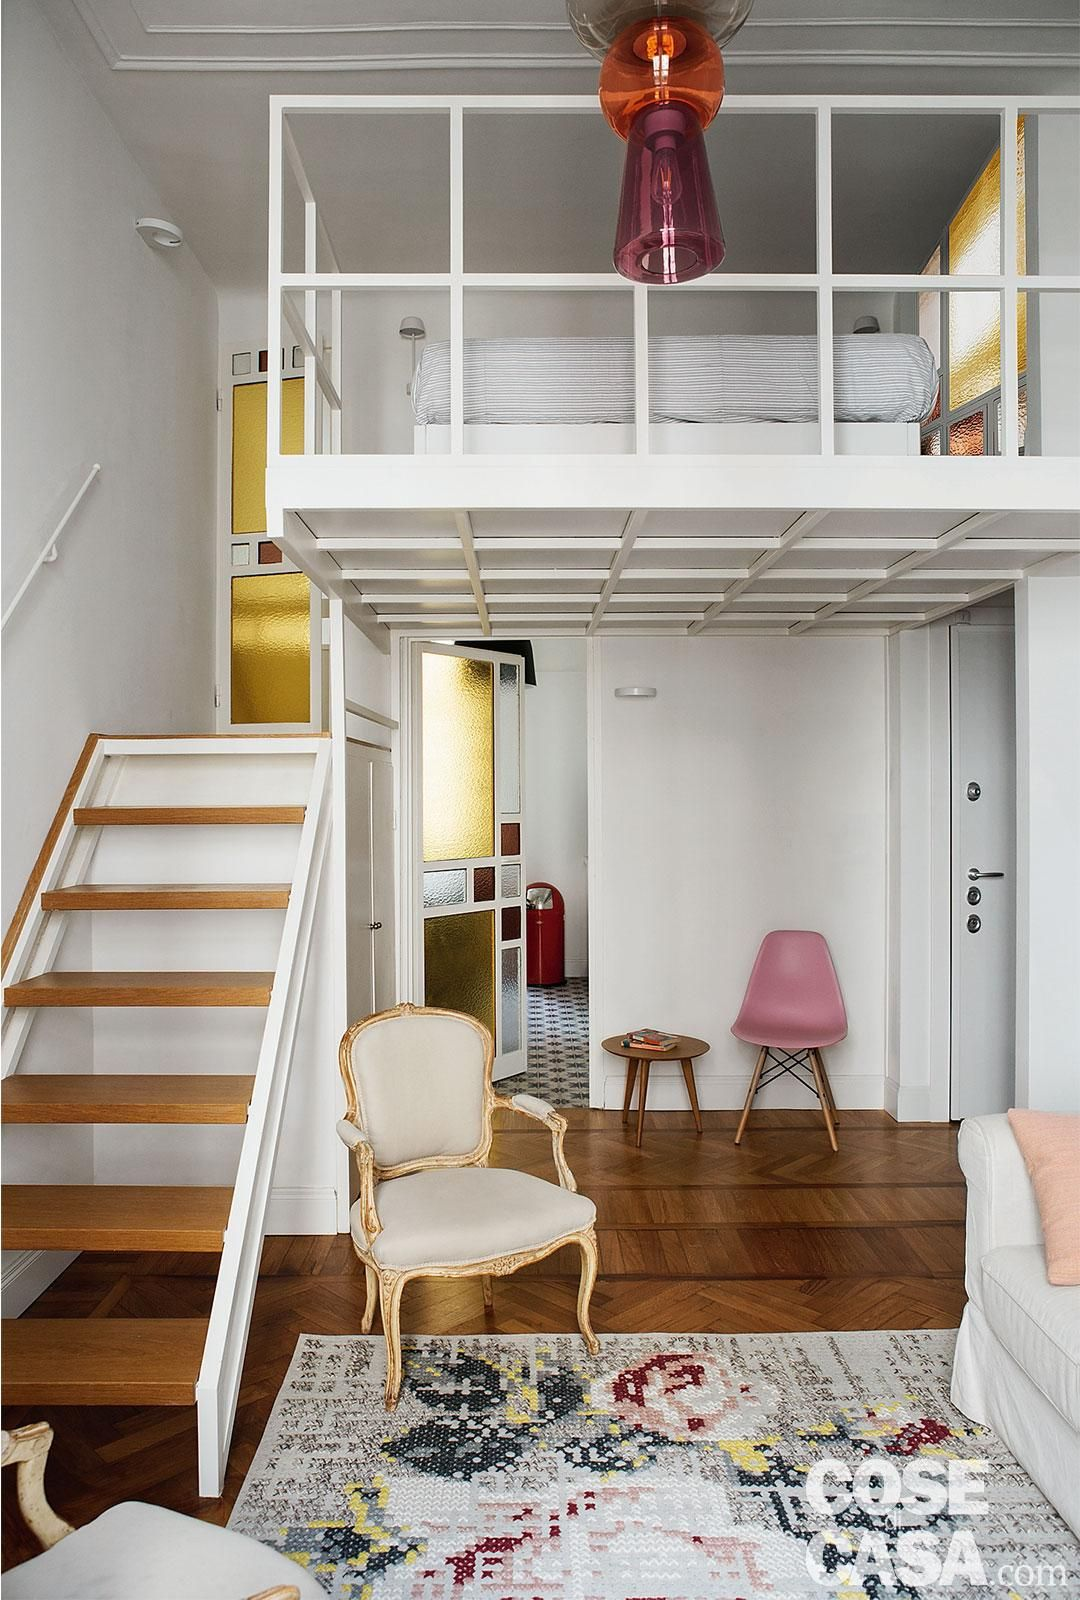 Installer Une Chambre En Hauteur Dans Un Studio Soppalco